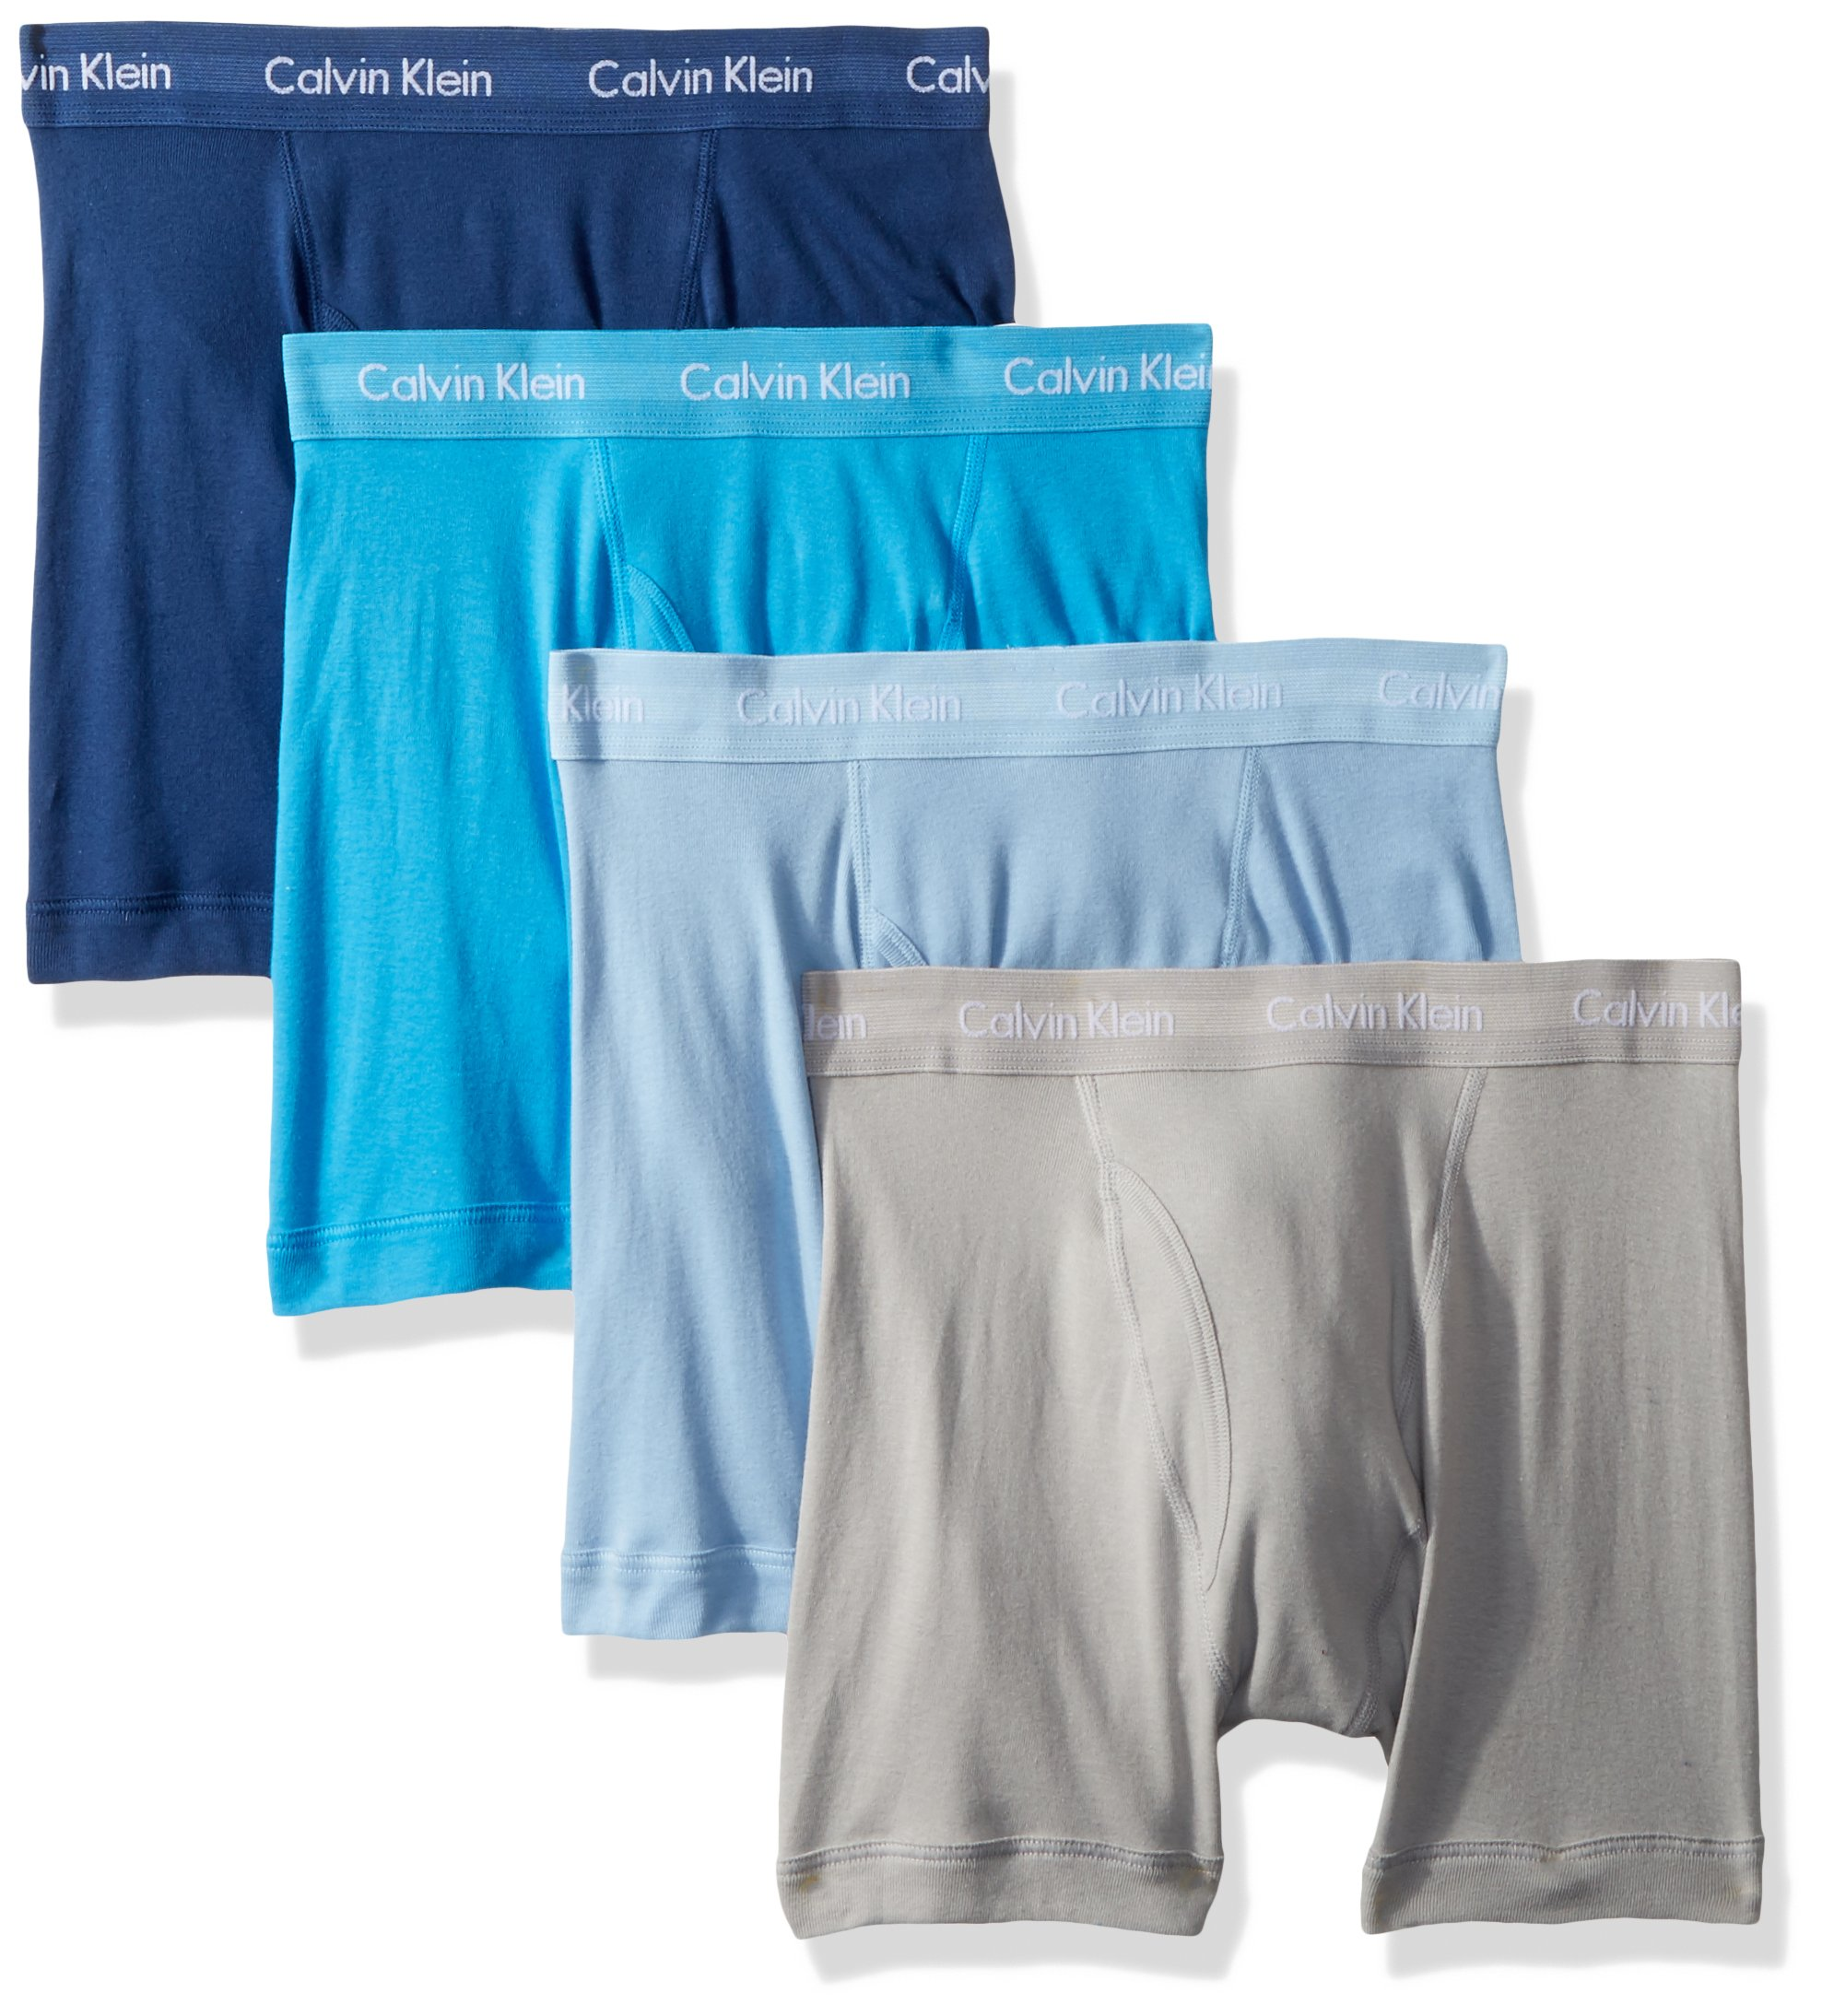 Calvin Klein Men's Cotton Classics Multipack Boxer Briefs, Gaze/Rapid Blue/Symphony/Clear Water, Medium by Calvin Klein